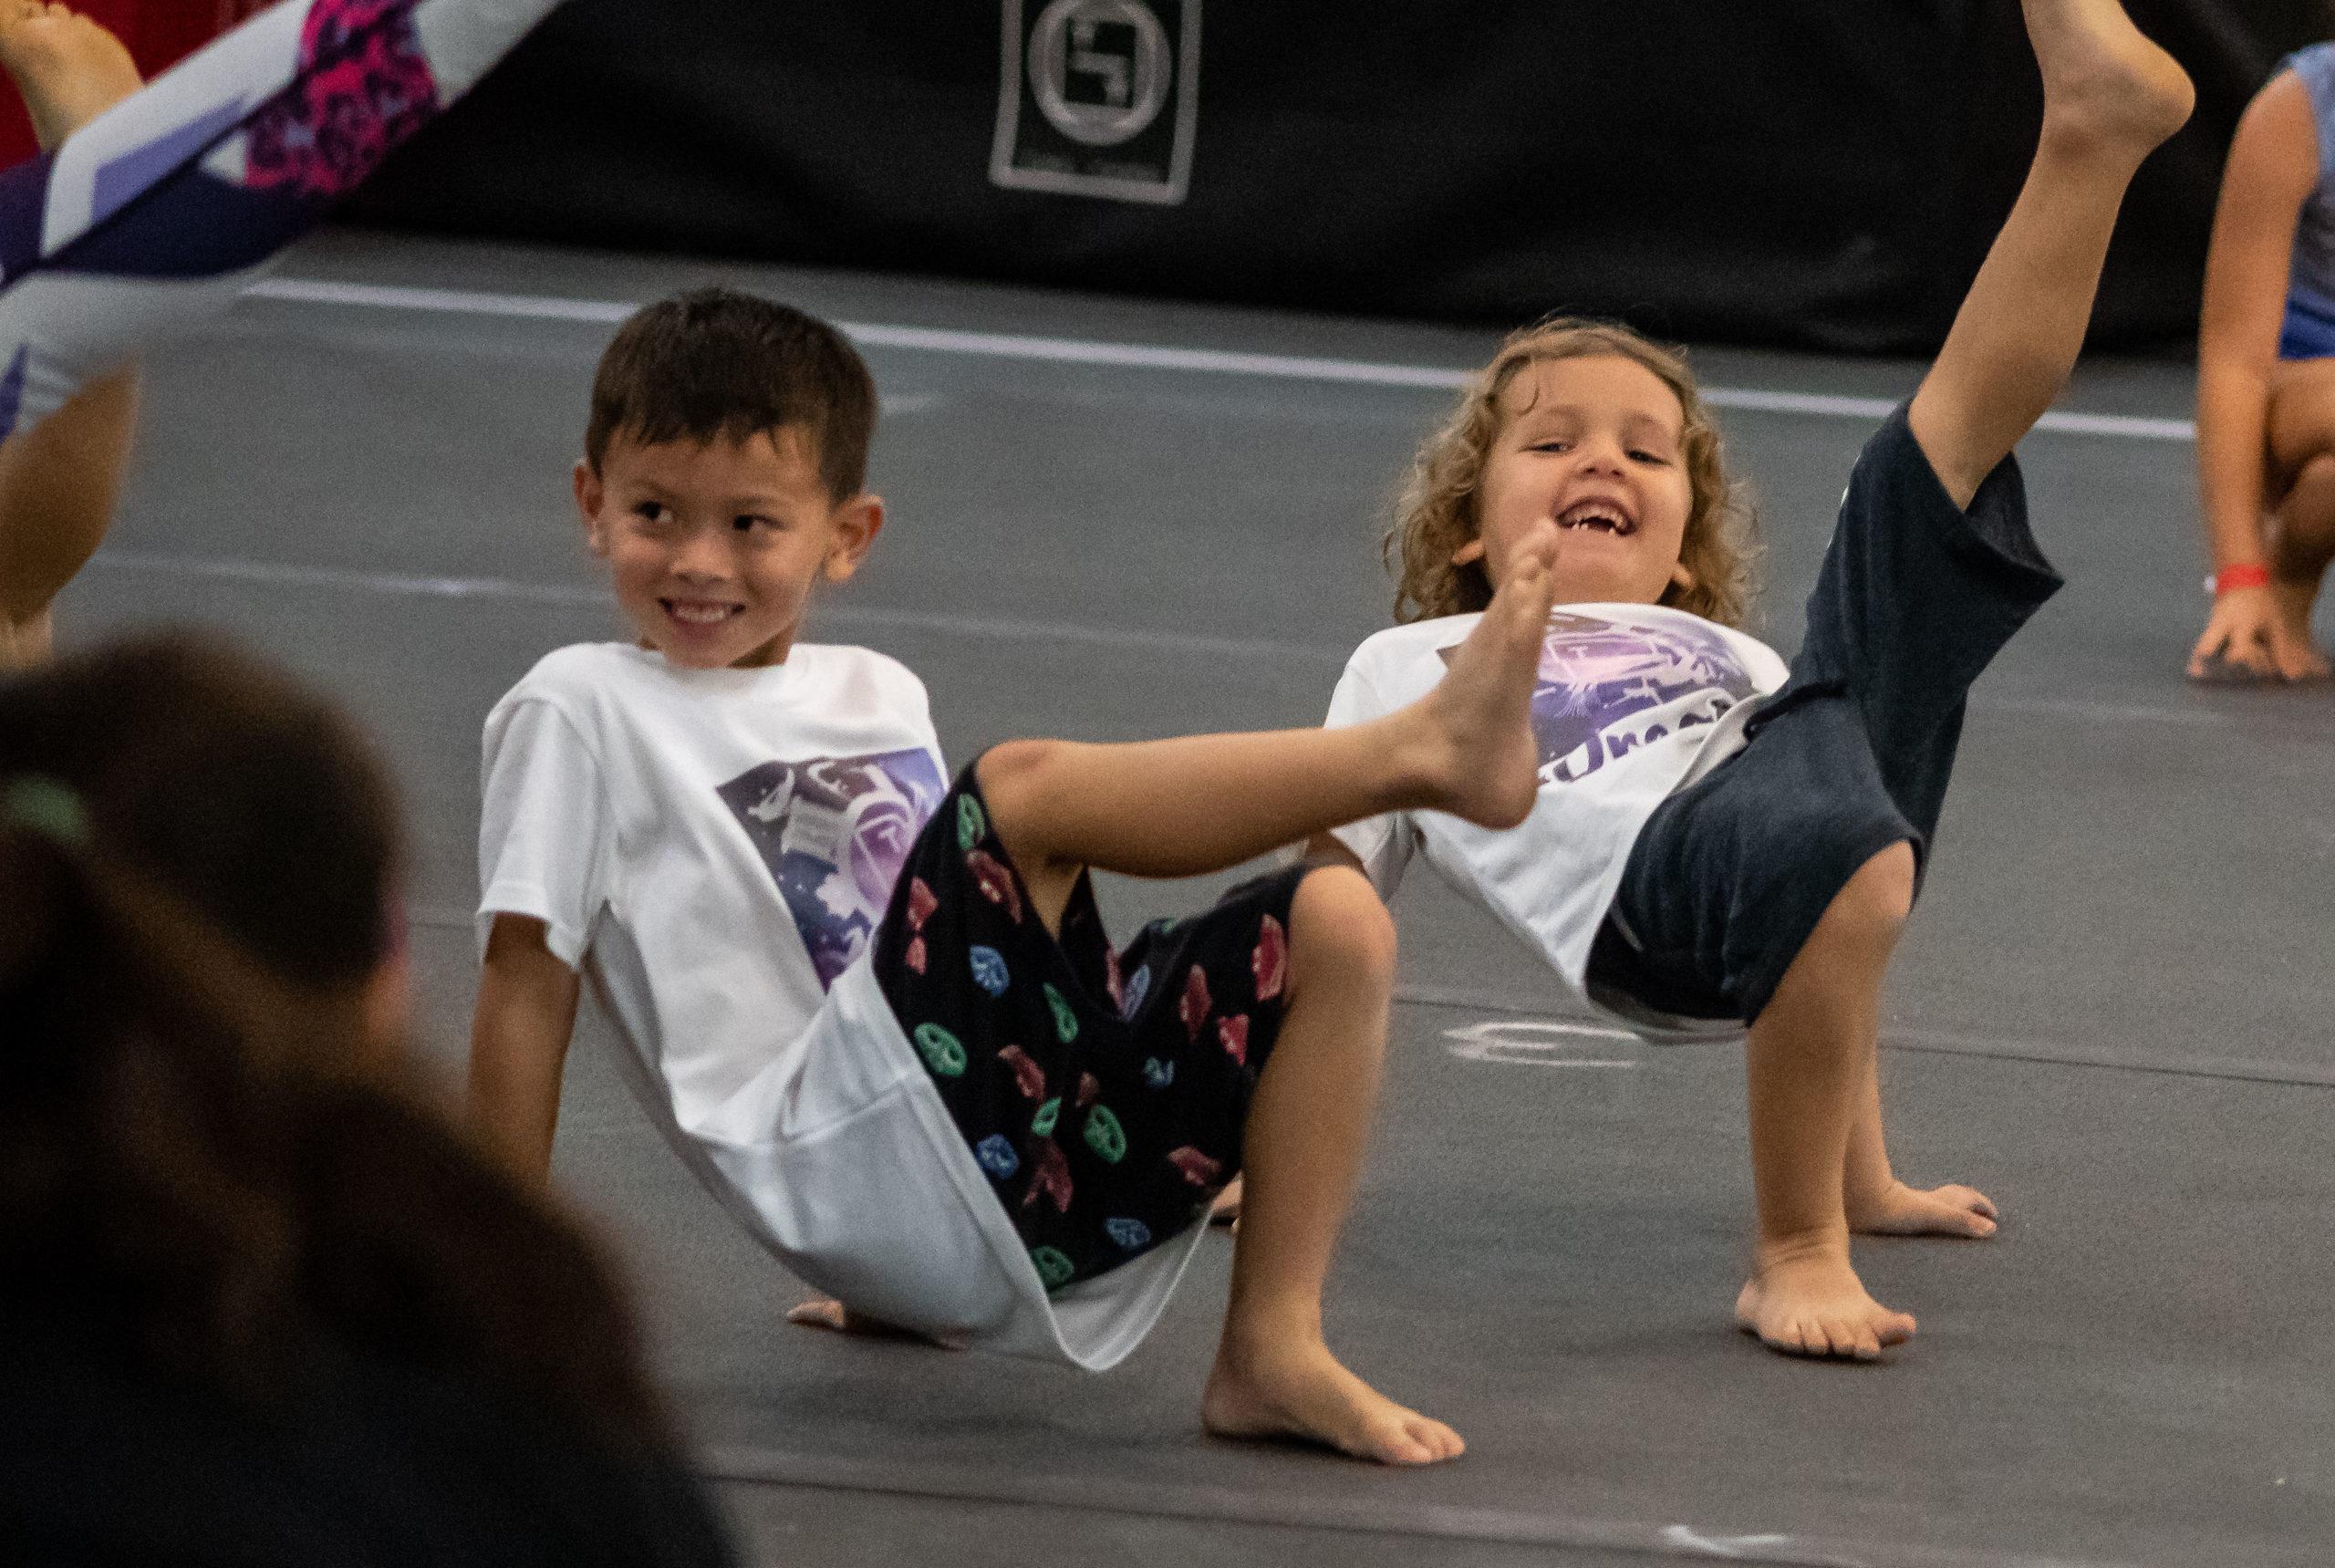 SeniorTumbling The Yard Singapore gymnastics classes